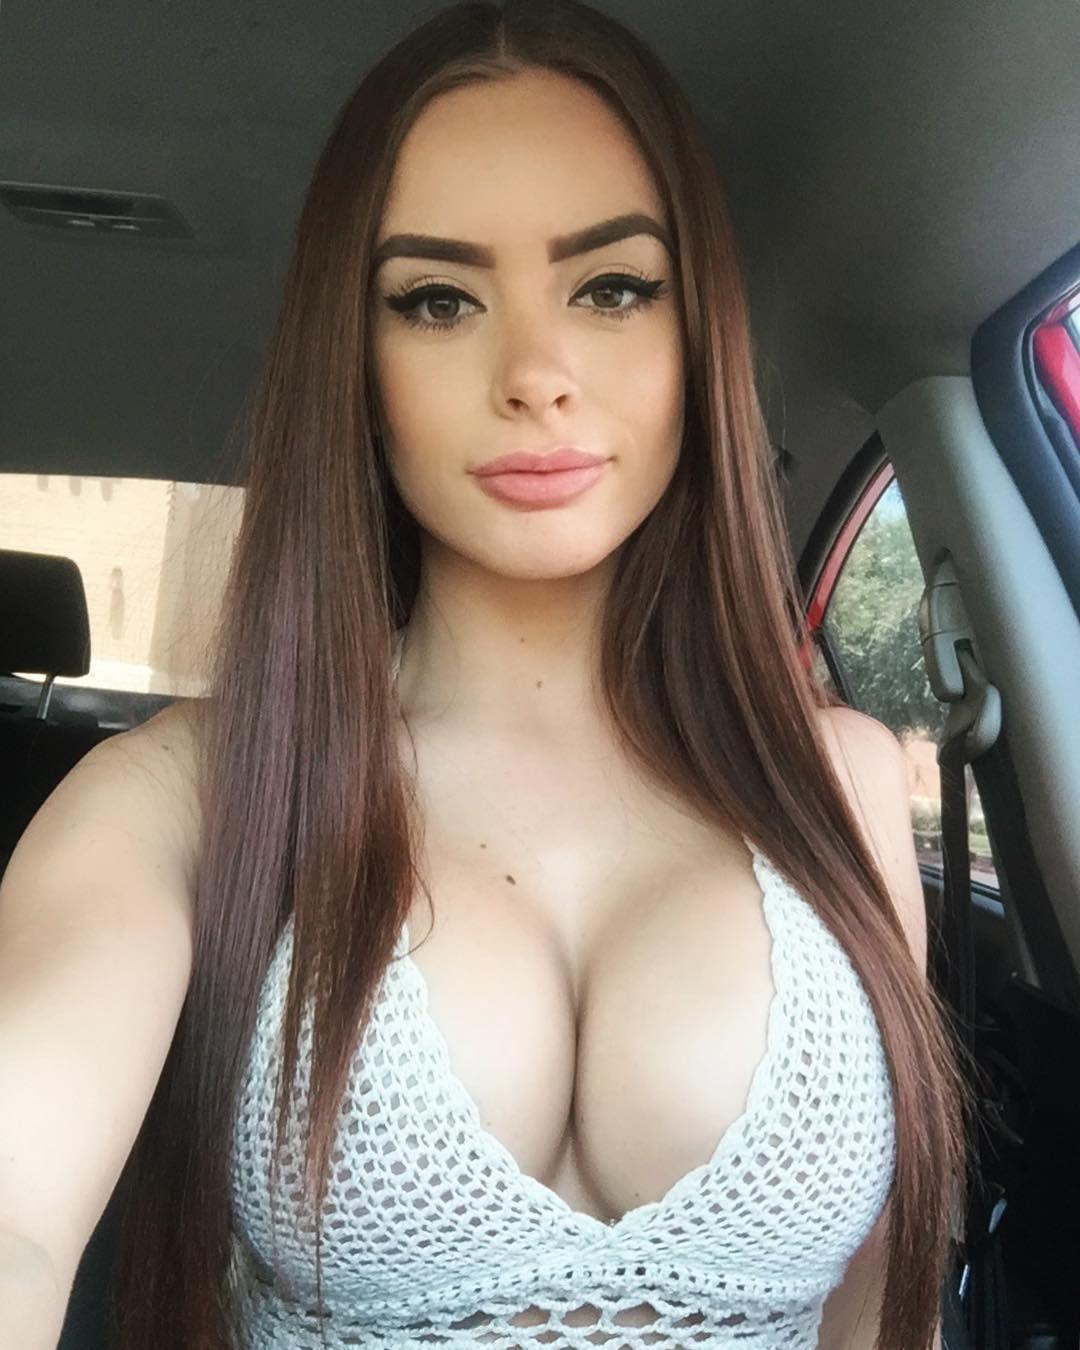 Hot Yolandi Visser nude photos 2019